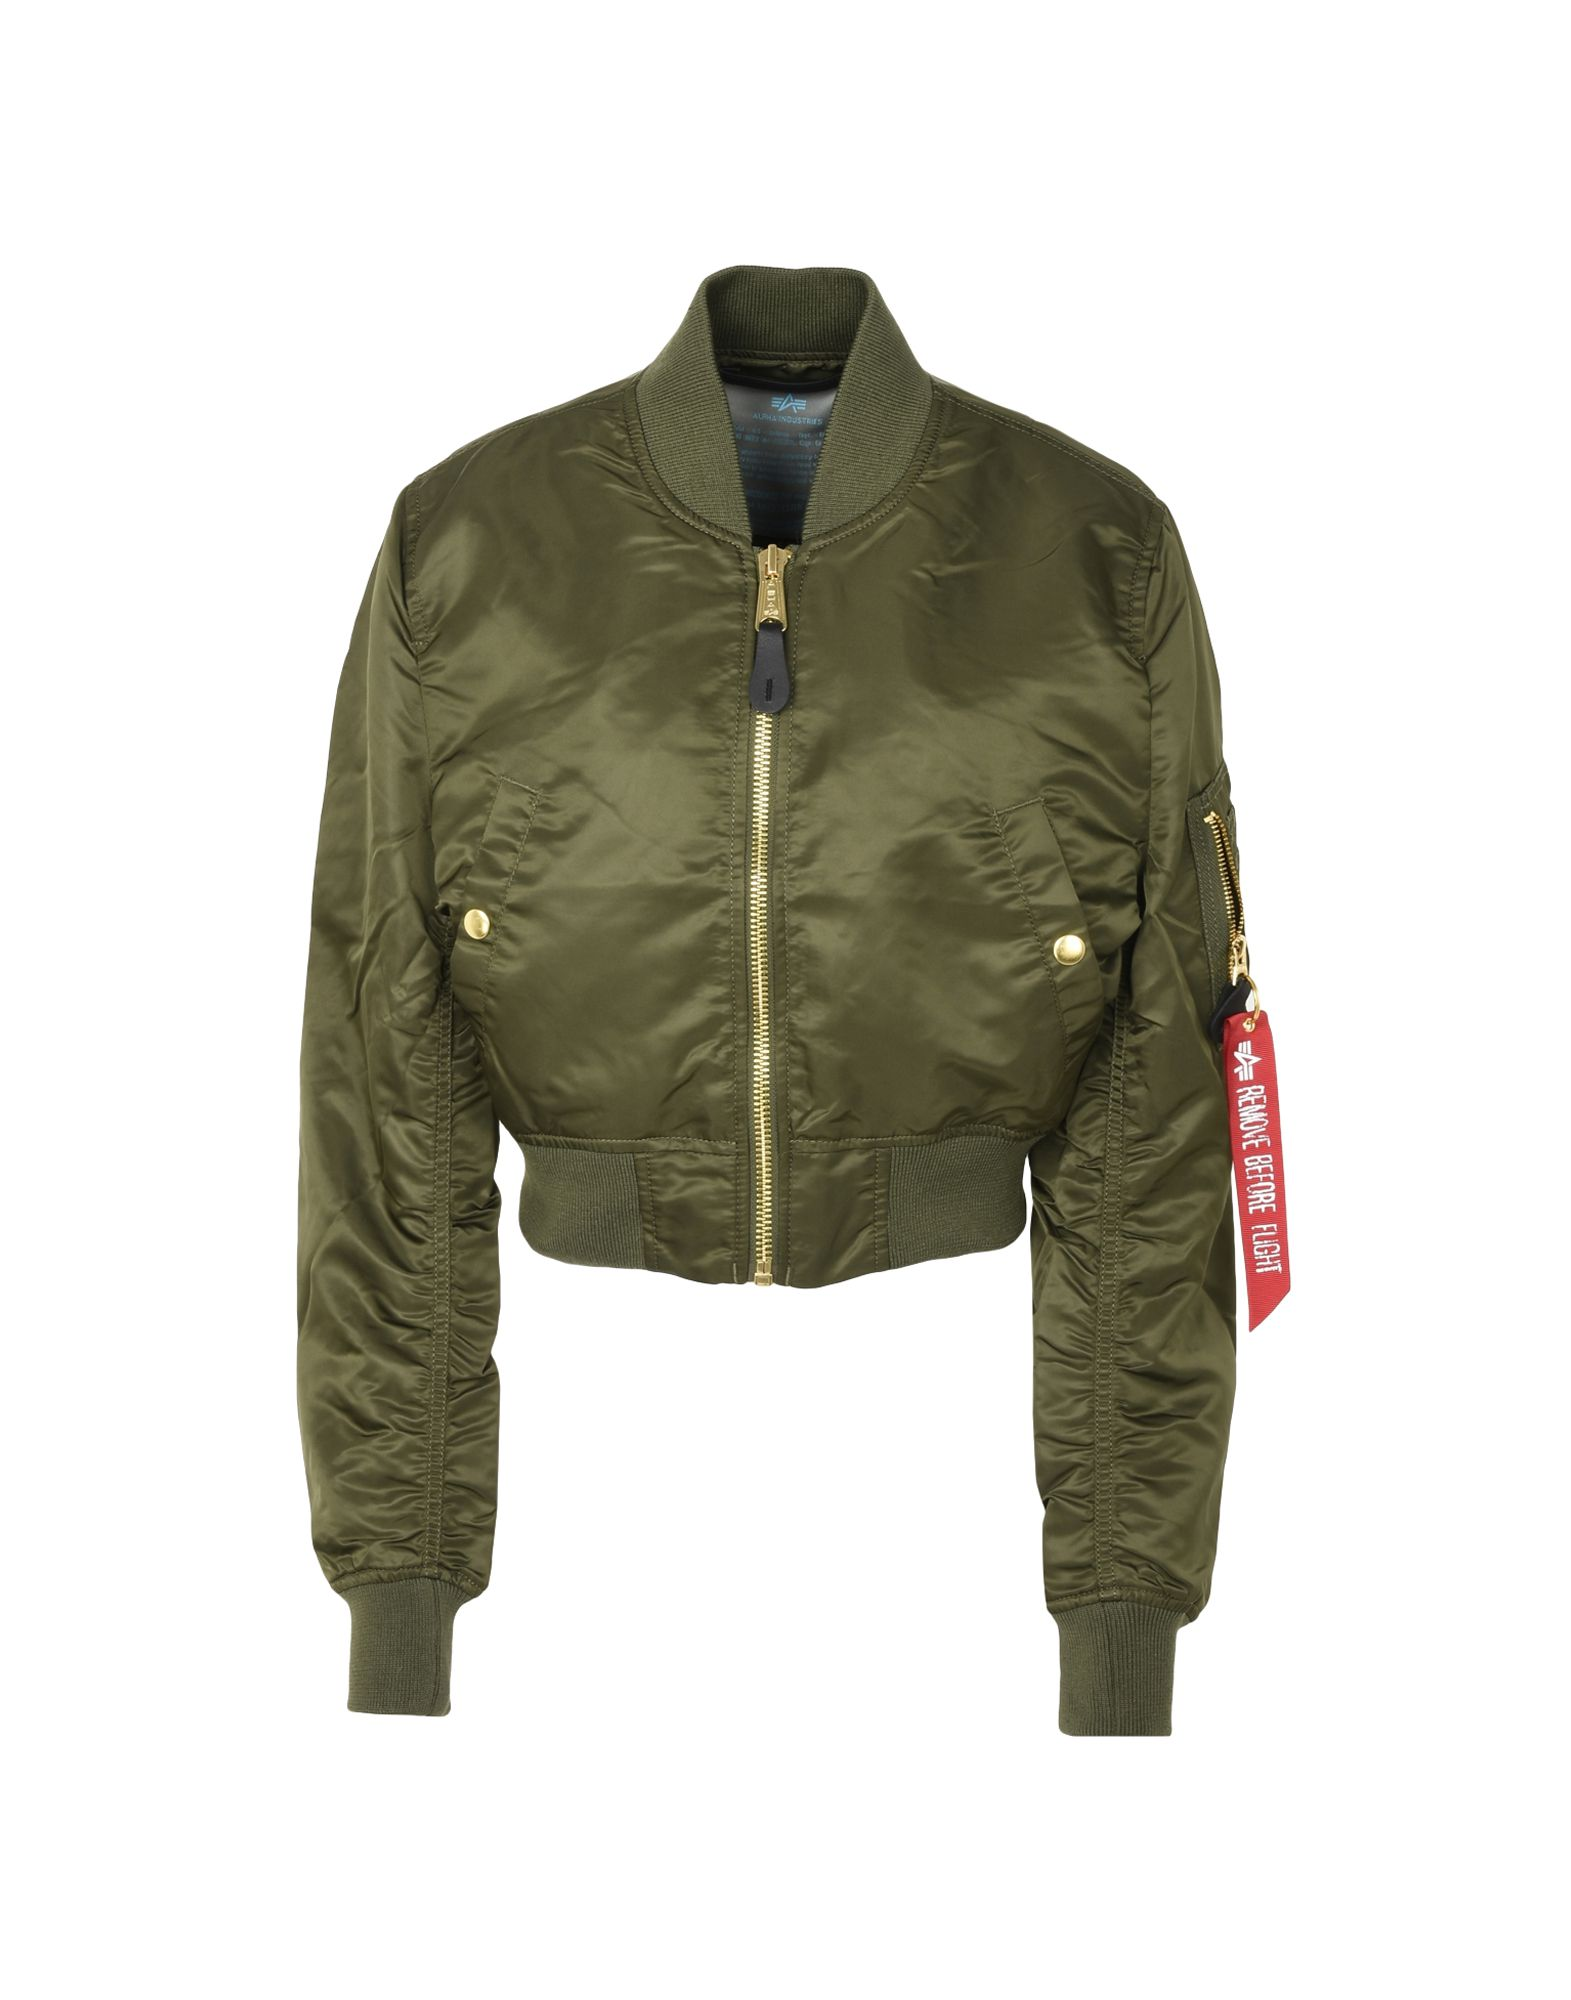 ALPHA INDUSTRIES INC. Damen Jacke Farbe Militärgrün Größe 5